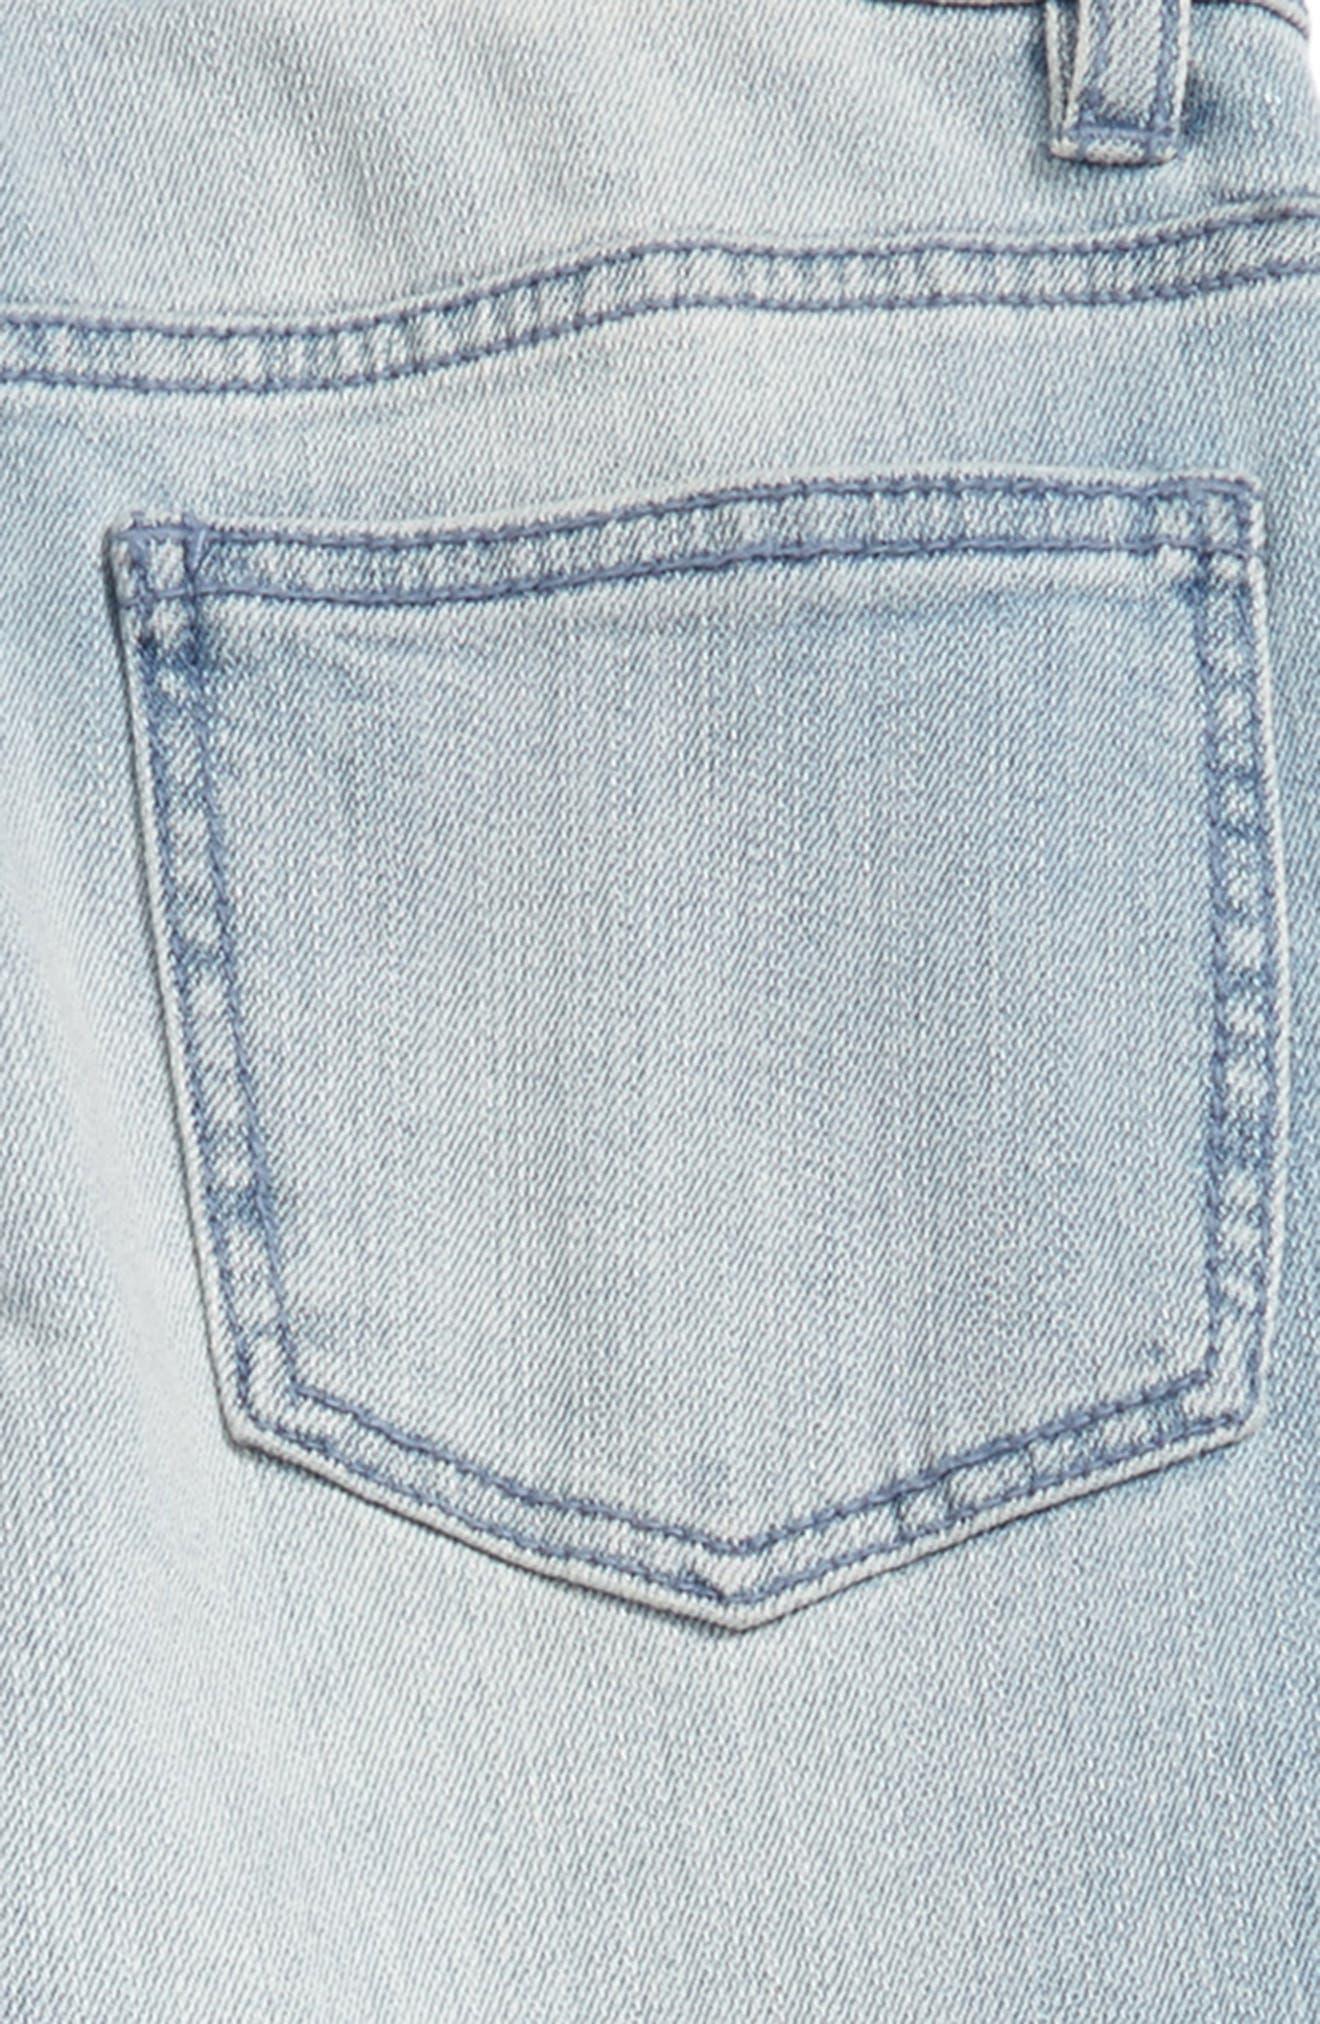 Alternate Image 3  - Elwood Rip & Repair Straight Leg Jeans (Big Boys)